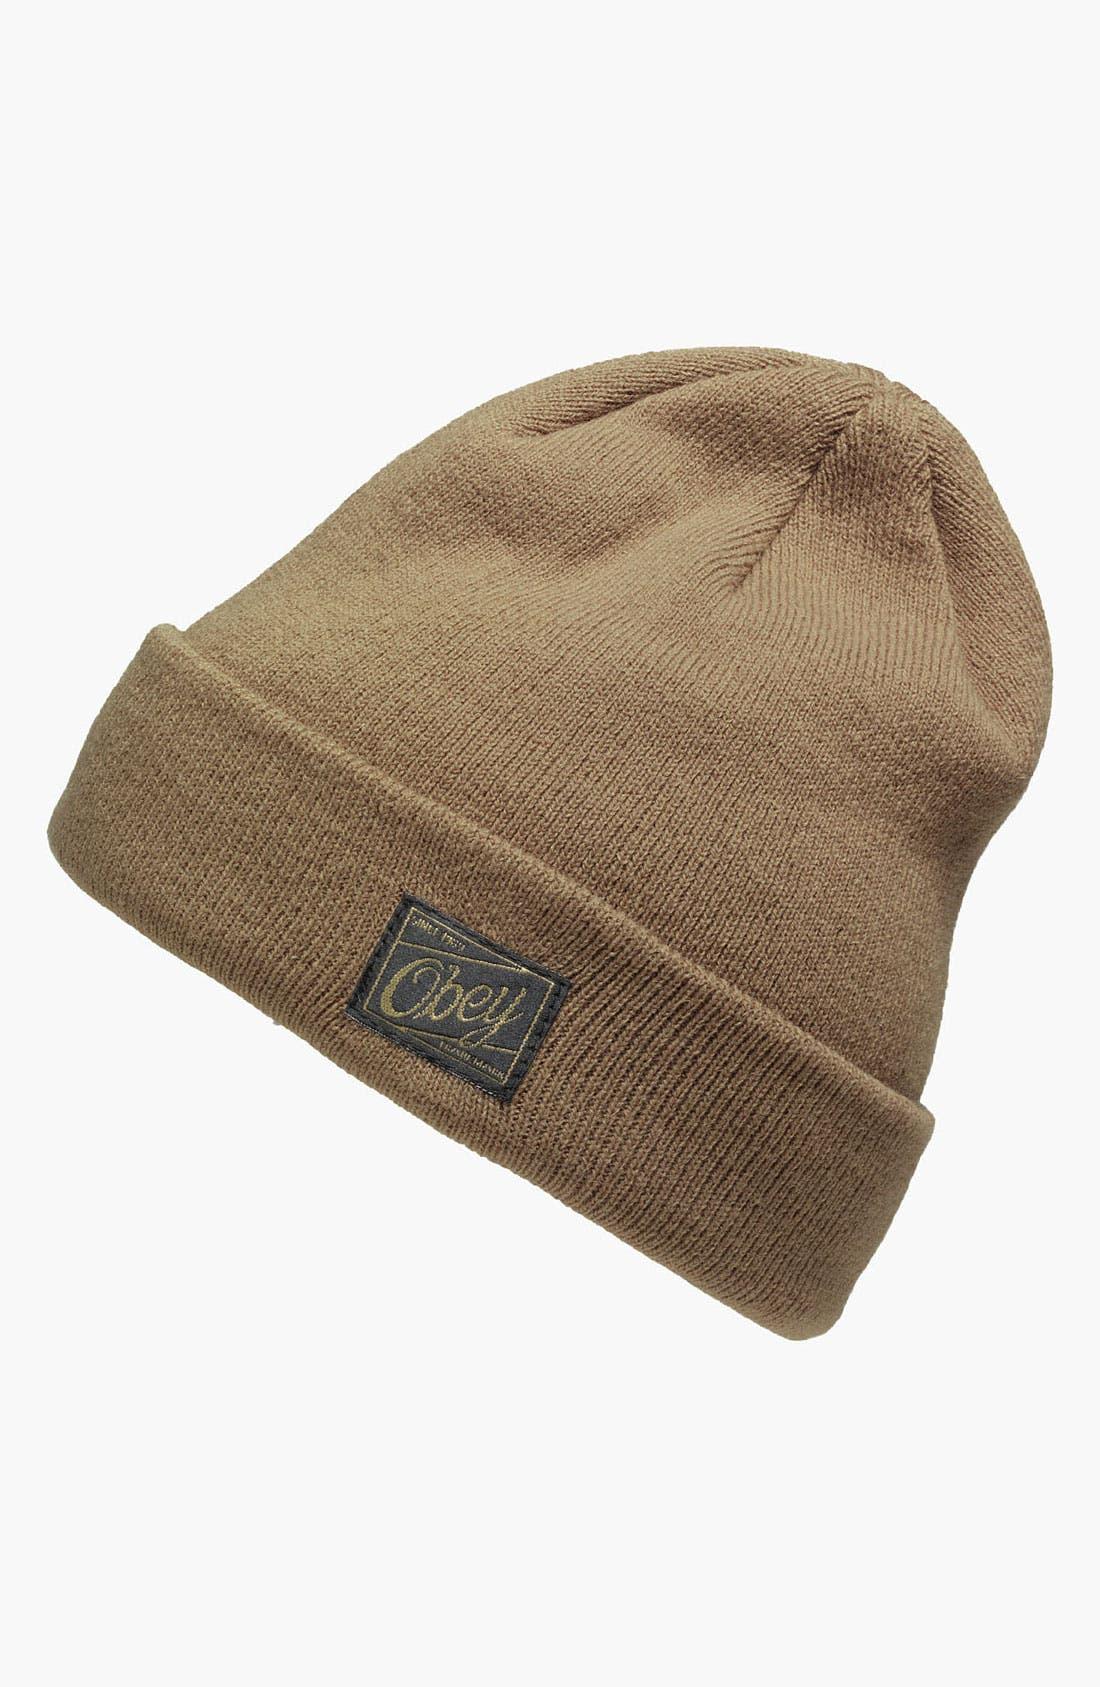 Alternate Image 1 Selected - Obey 'Jobber' Knit Cap